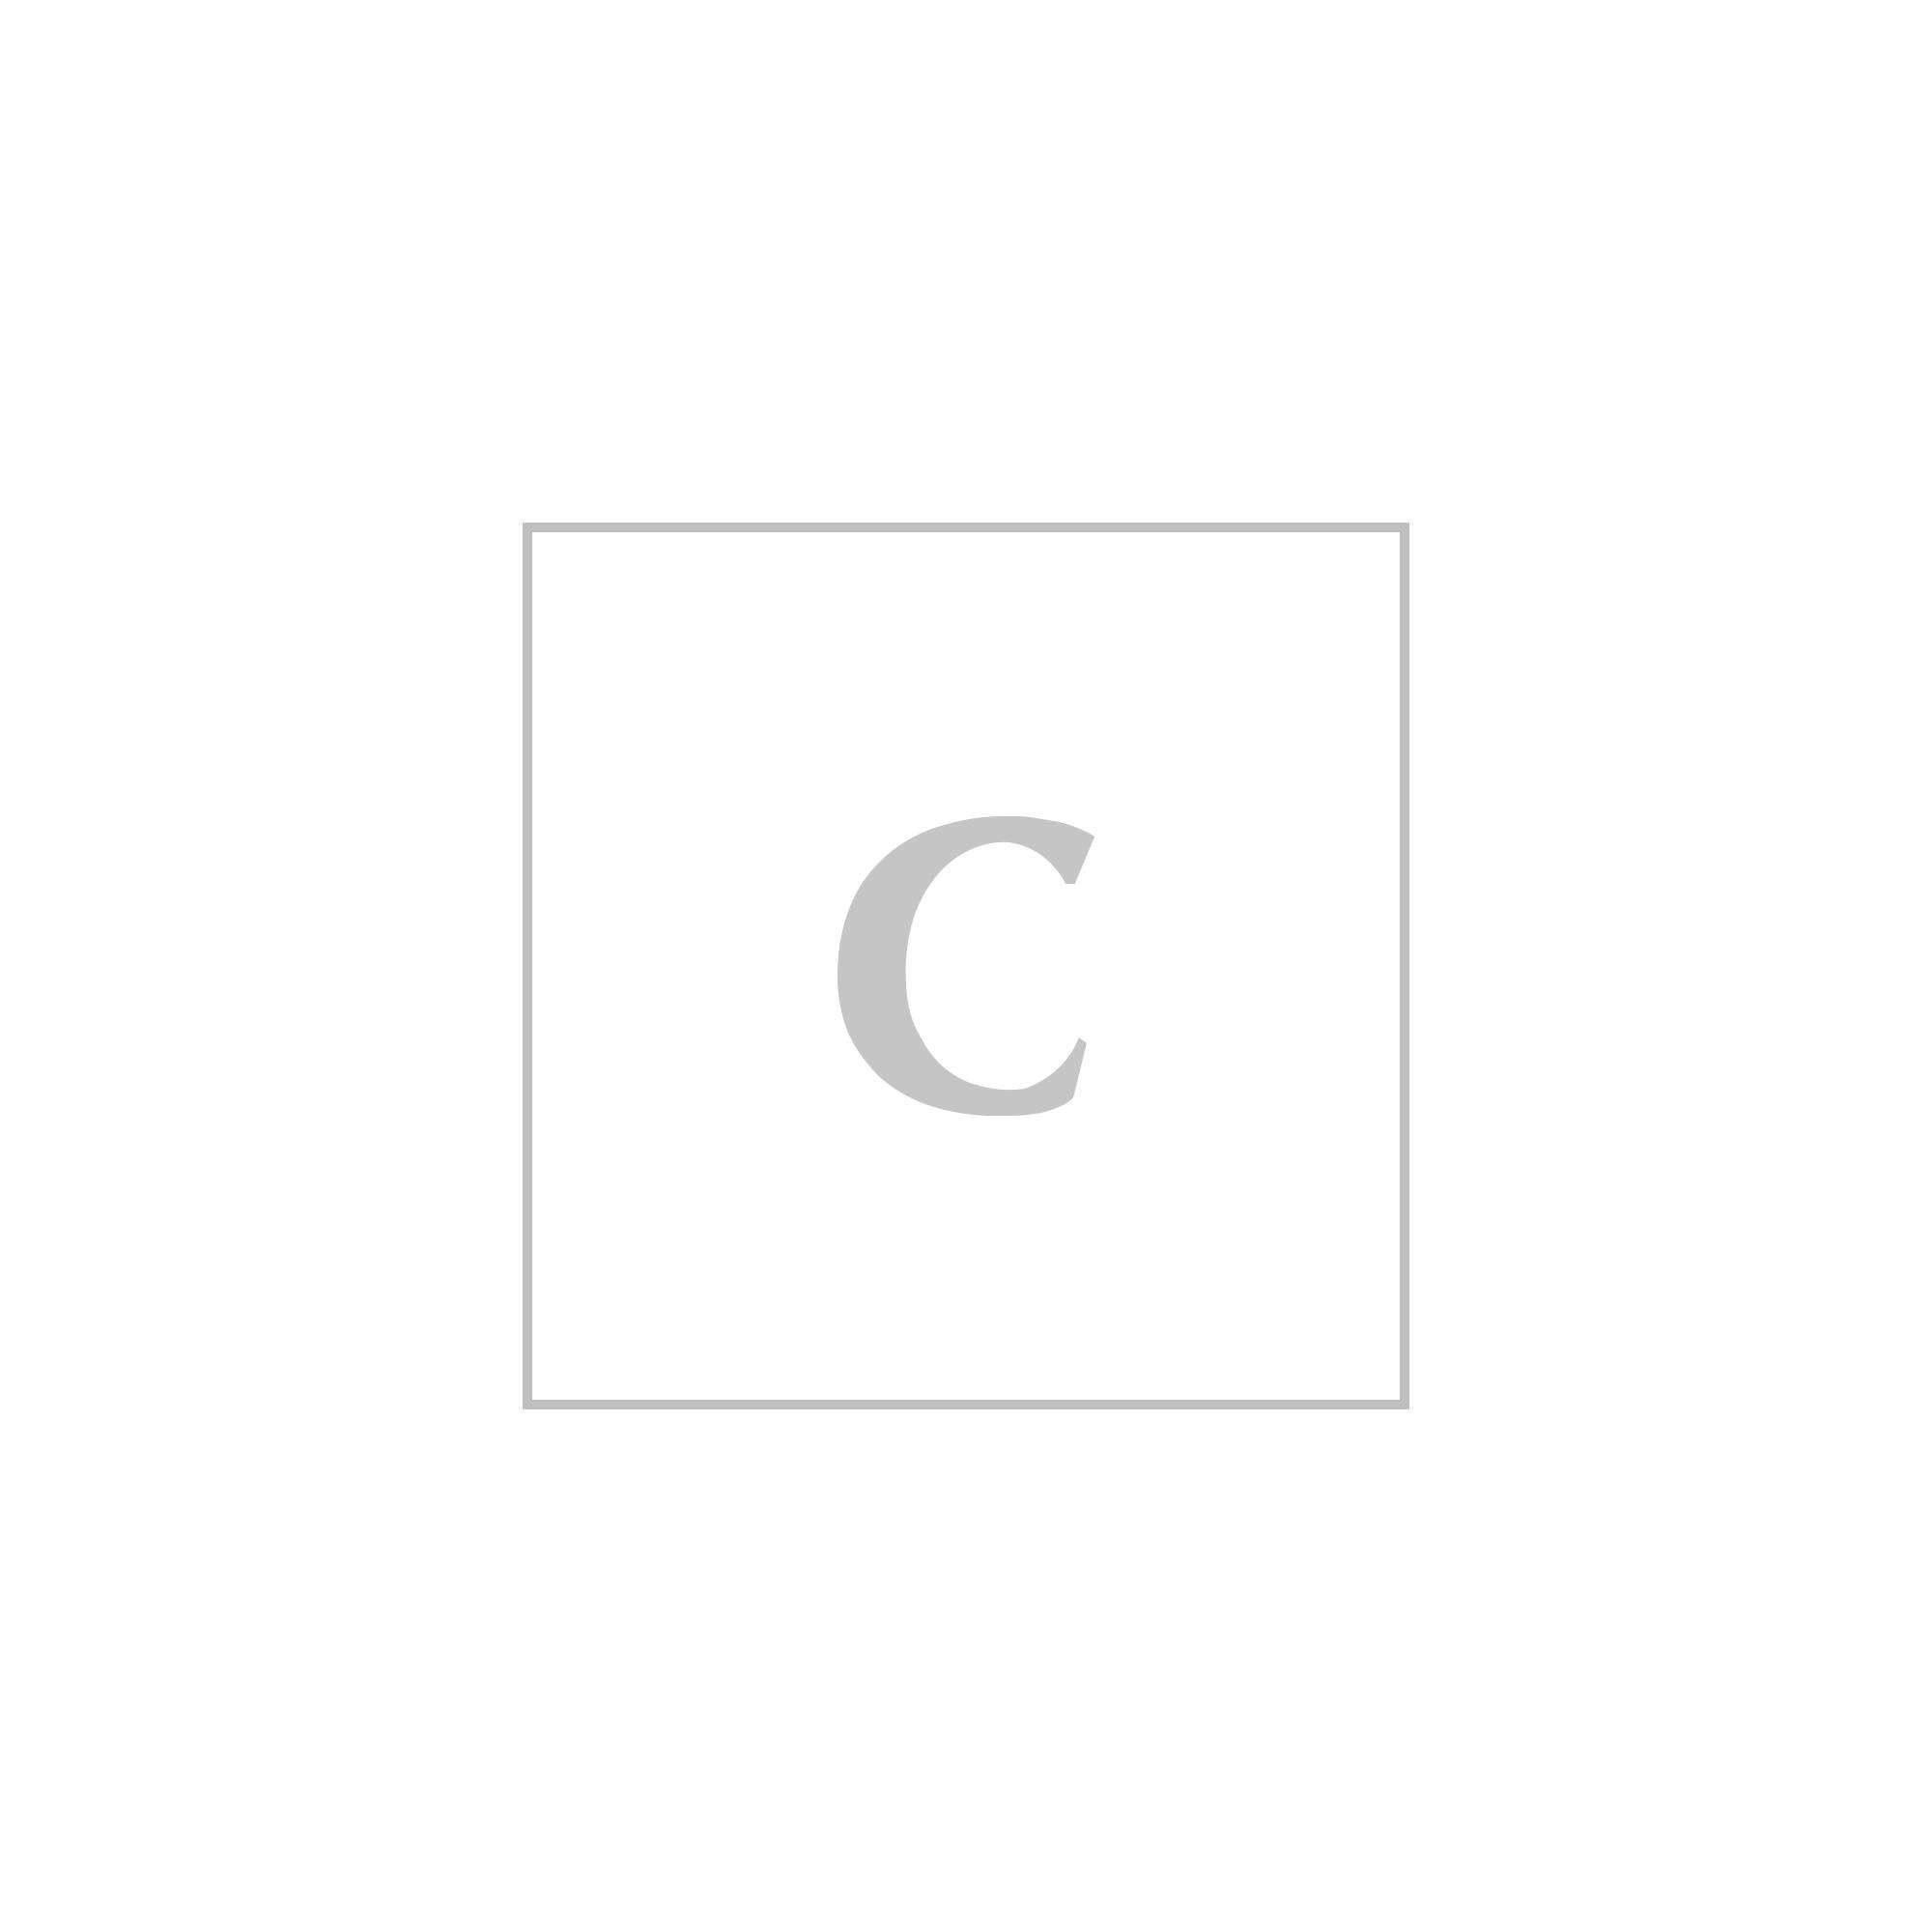 b33cf32fb732 Wallets Prada for Donna Colori Misti